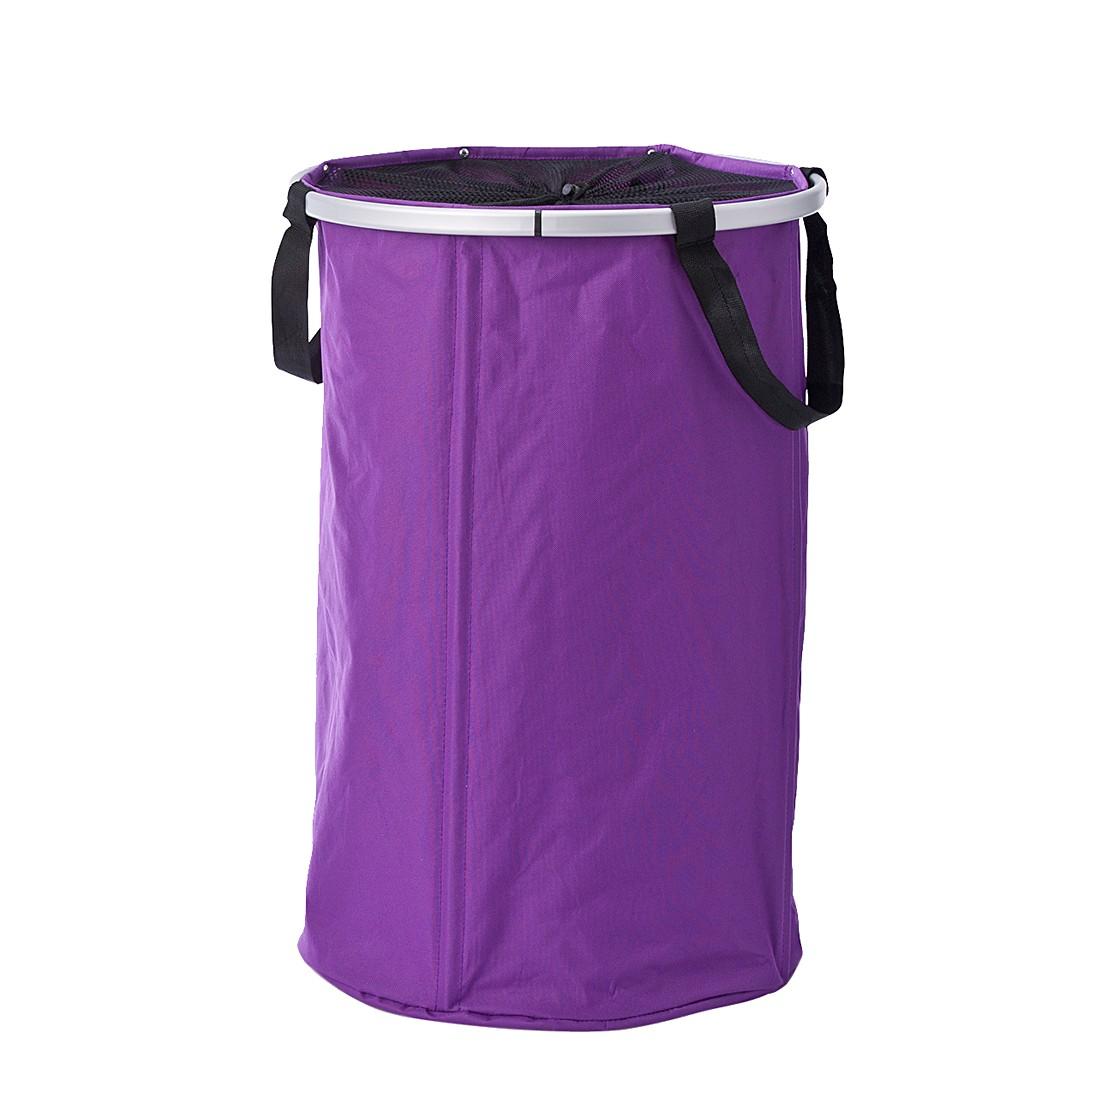 Wäschesammler Mesa – lila, Zeller günstig kaufen